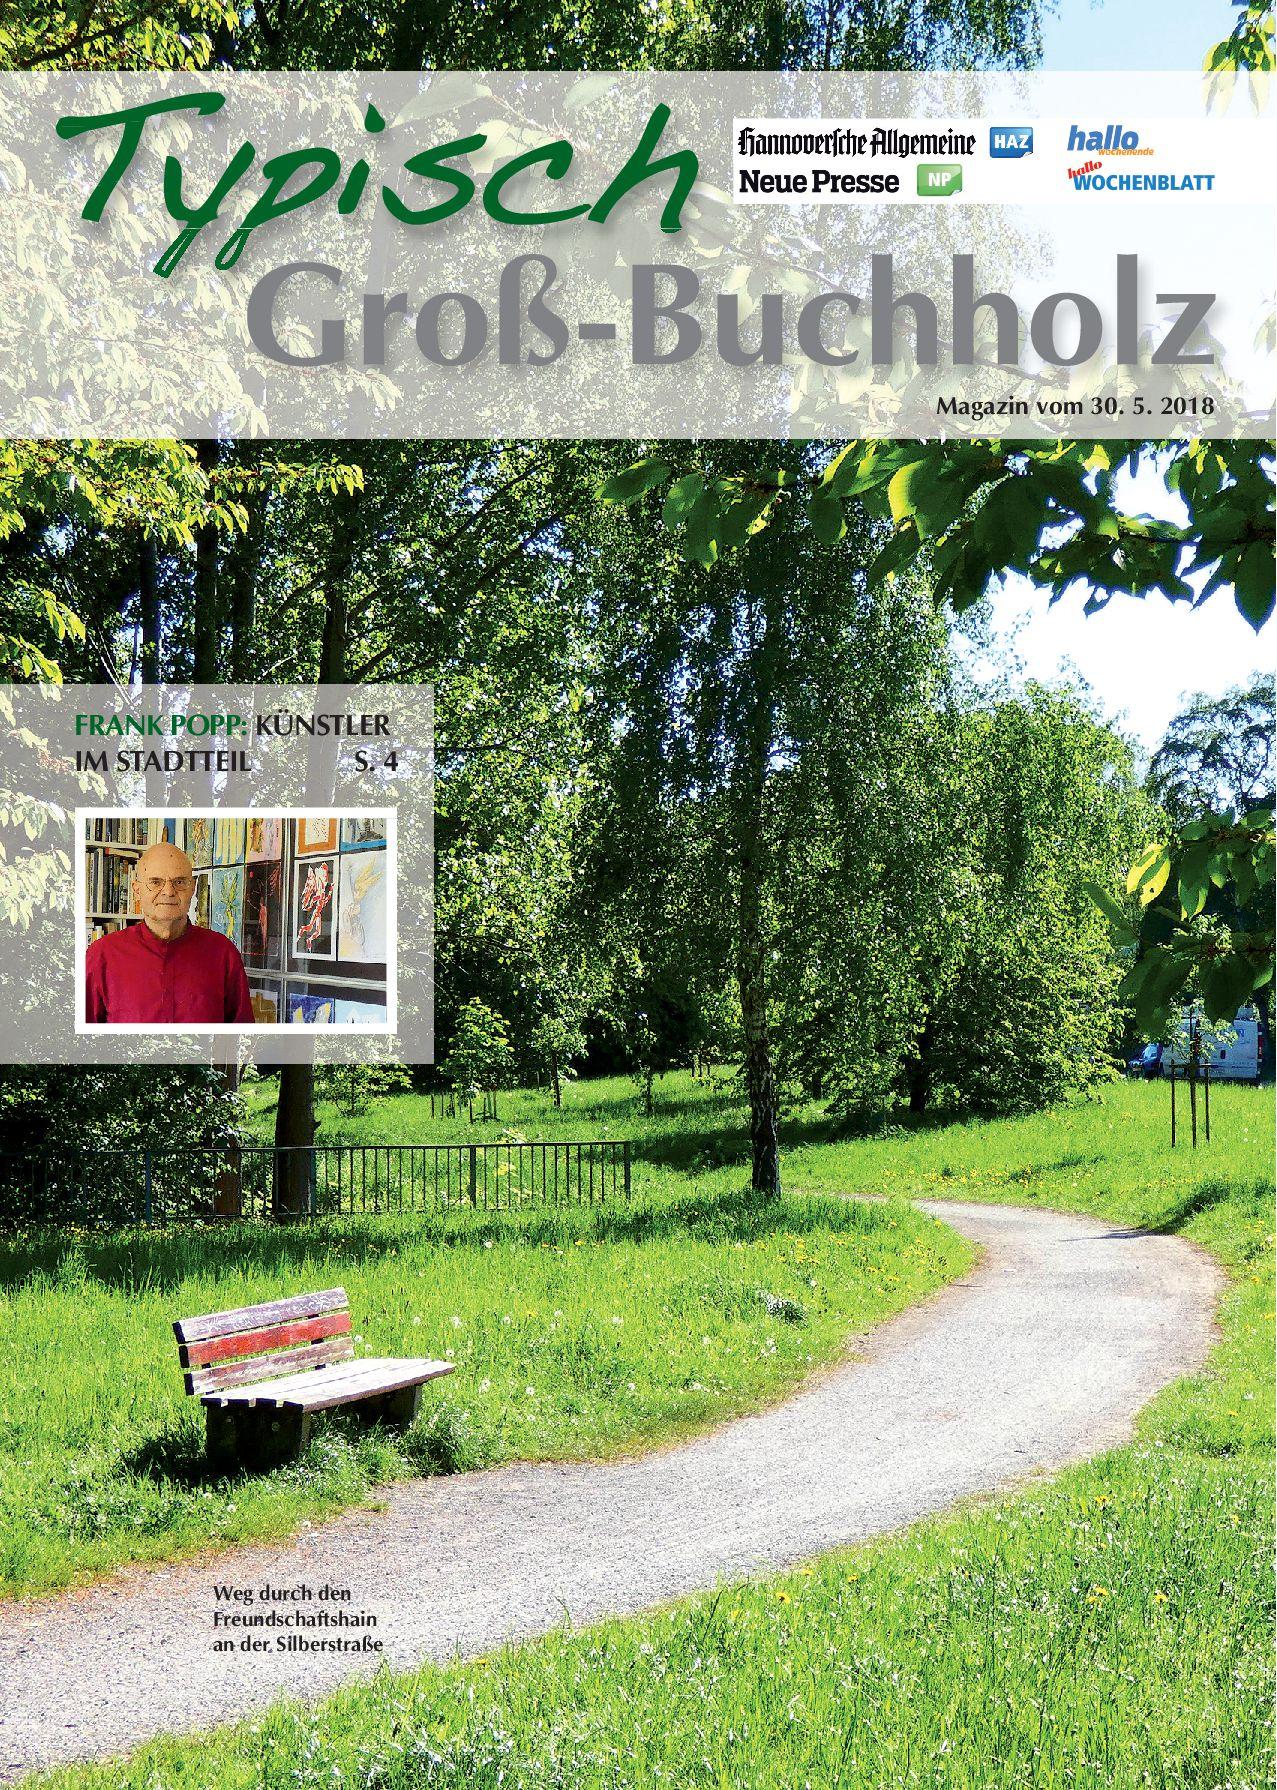 gross-buchholz-vom-30-05-2018